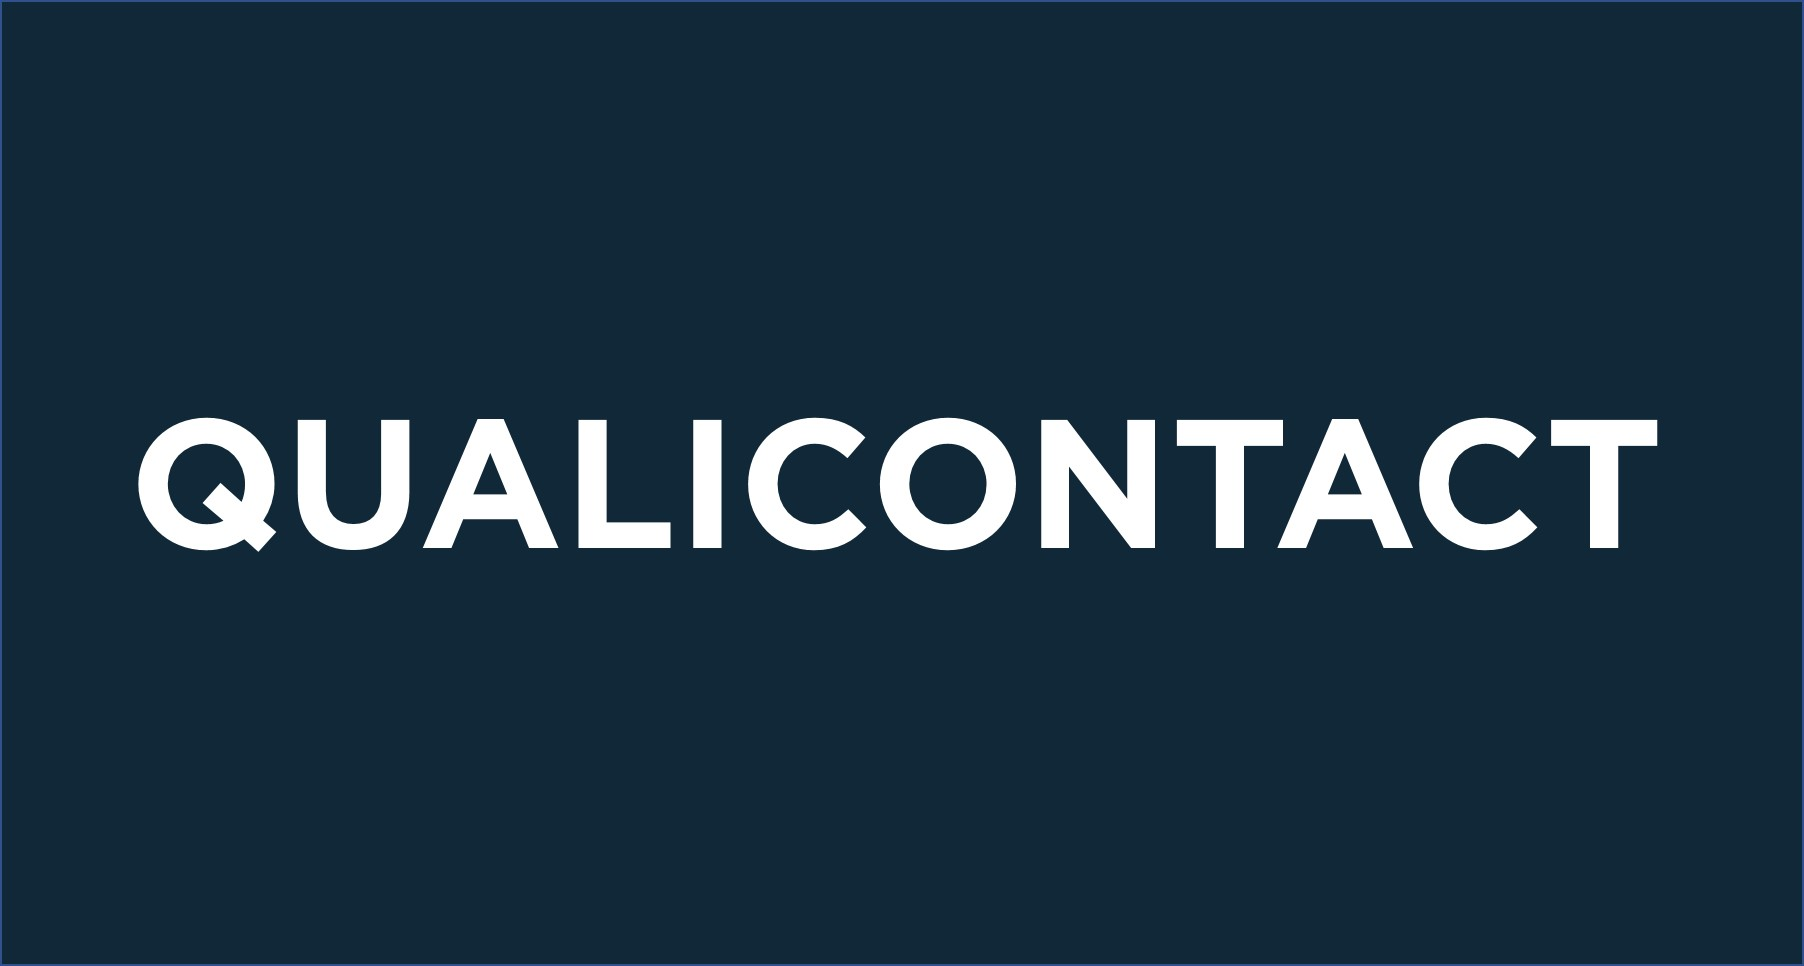 Qualicontact